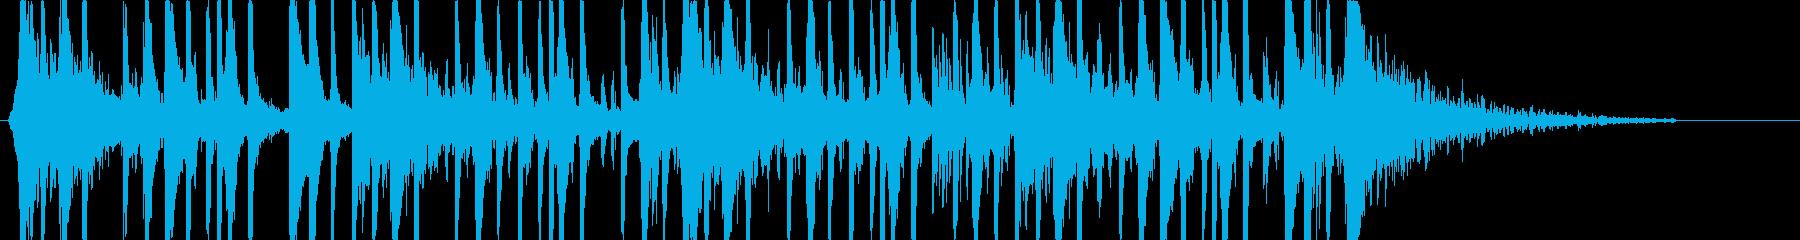 CM映像向けドラムとクラップのストンプ曲の再生済みの波形